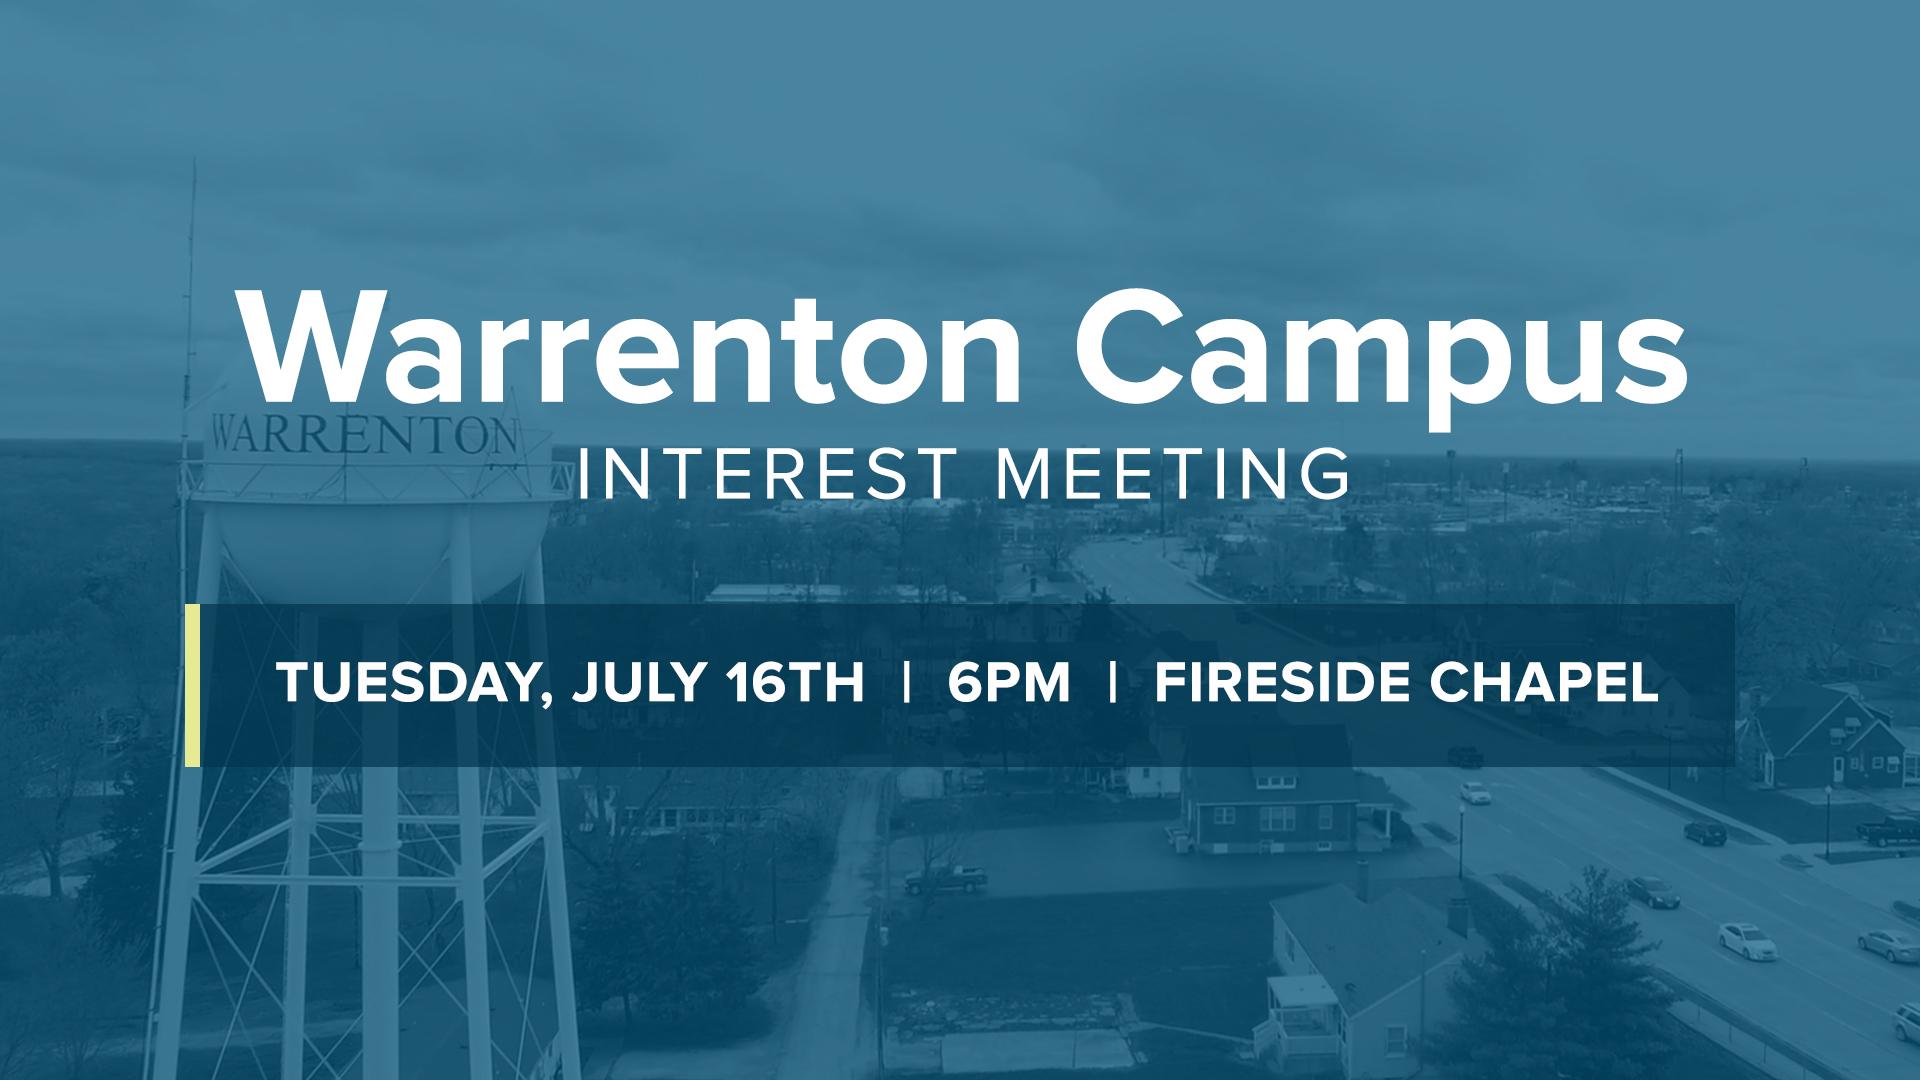 Warrenton Interest Meeting 071619.jpg